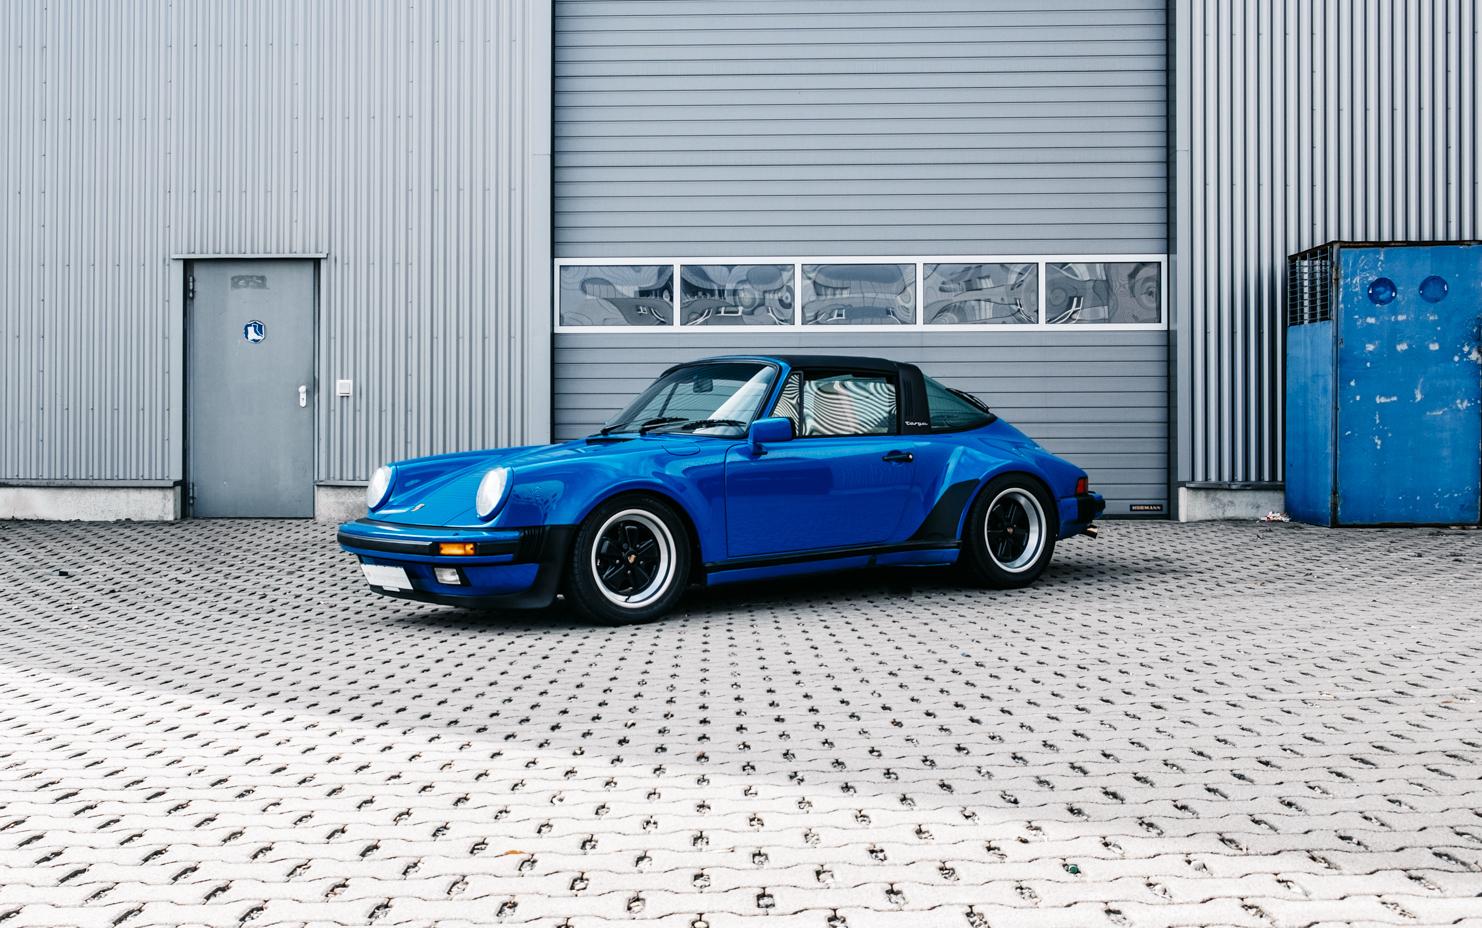 Porsche 911 G Model For Sale Elferspot The Used Porsche Marketplace